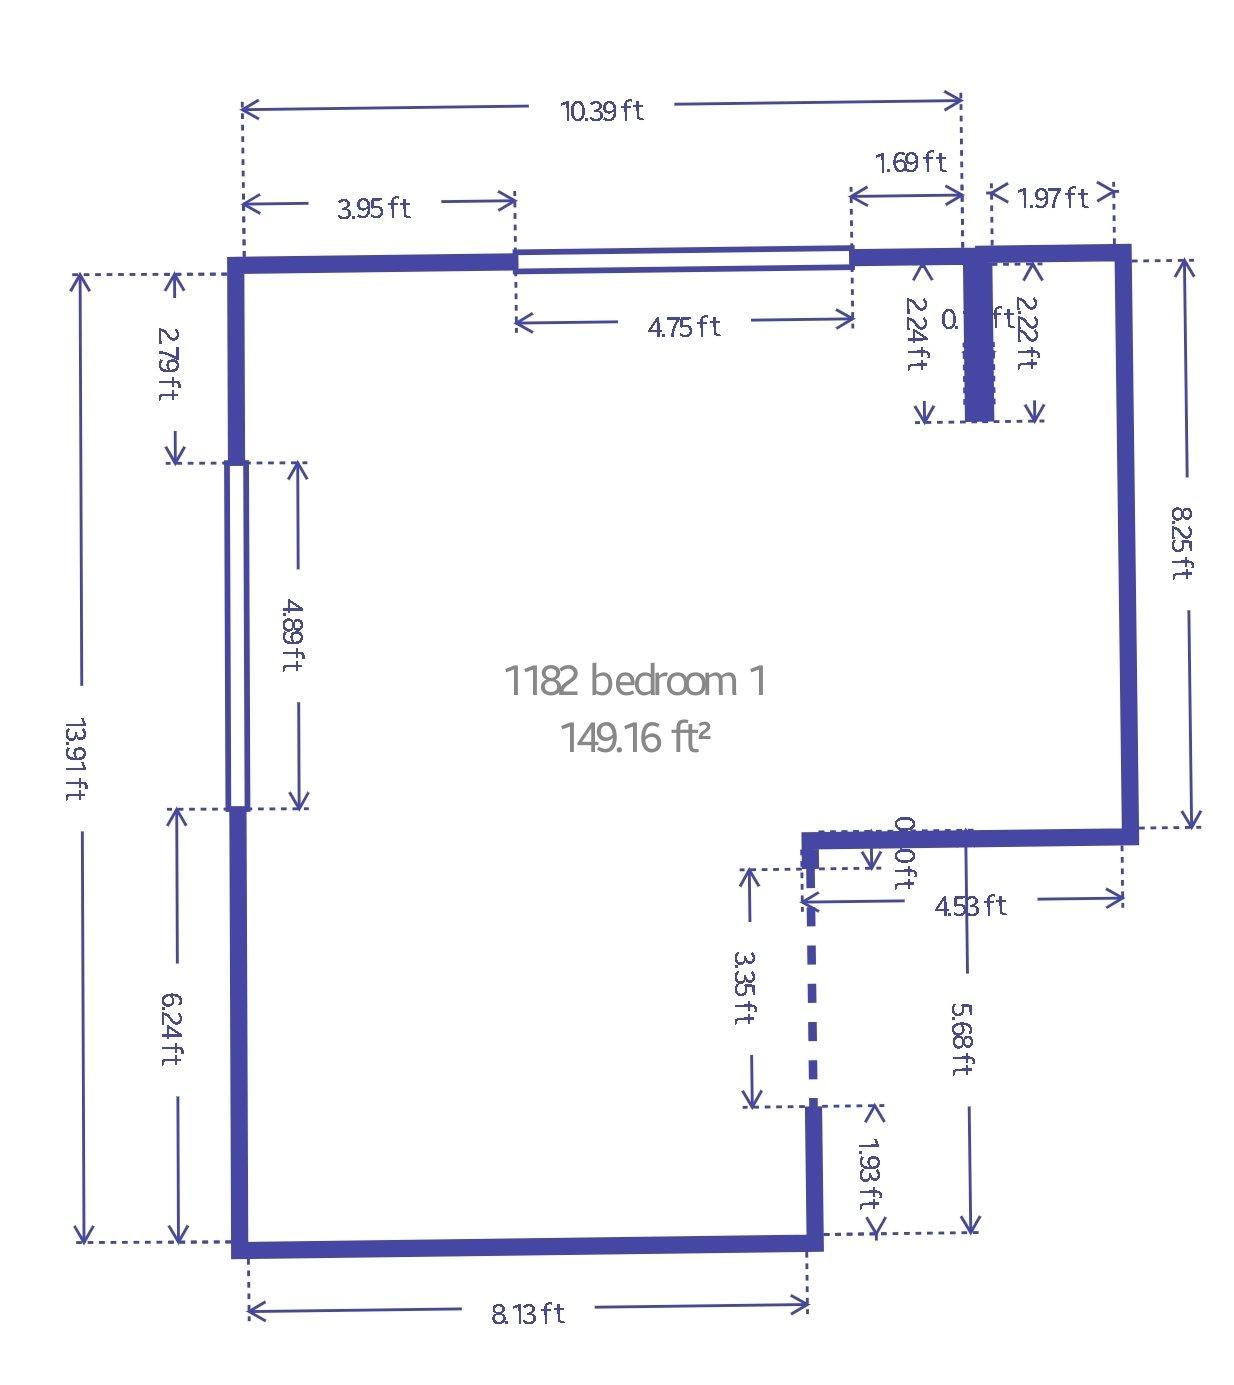 13x10 Bedroom self storage unit